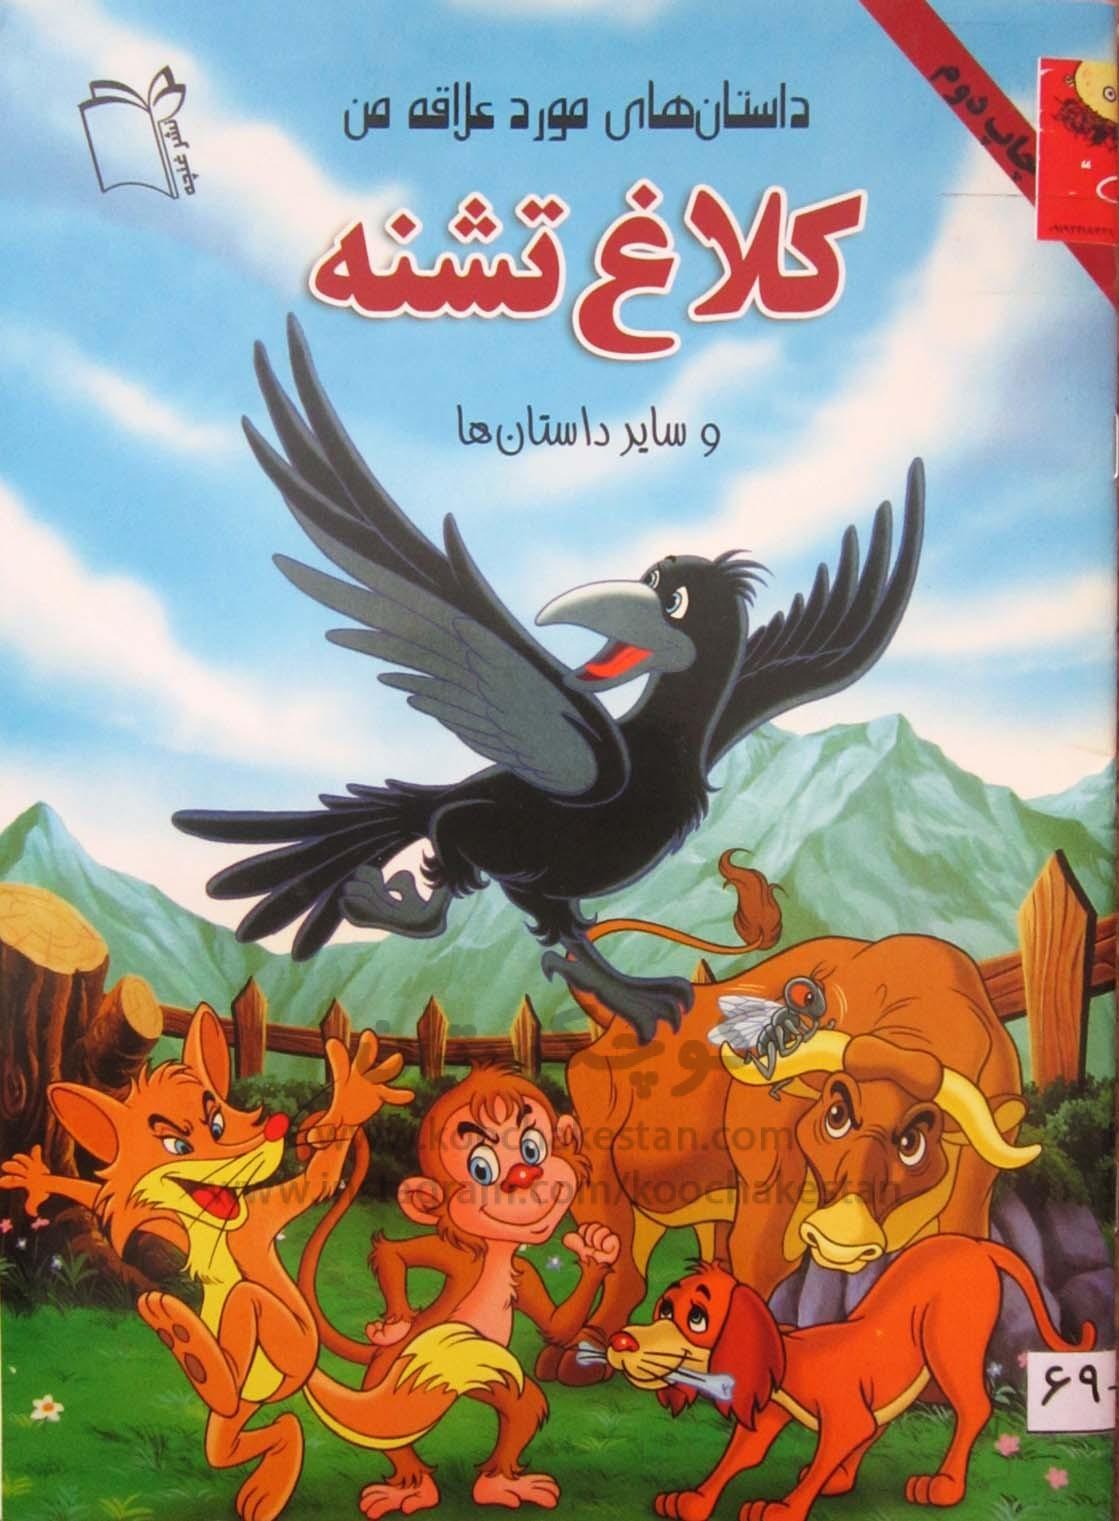 کلاغ تشنه - کتابخانه کودک - کوچکستان